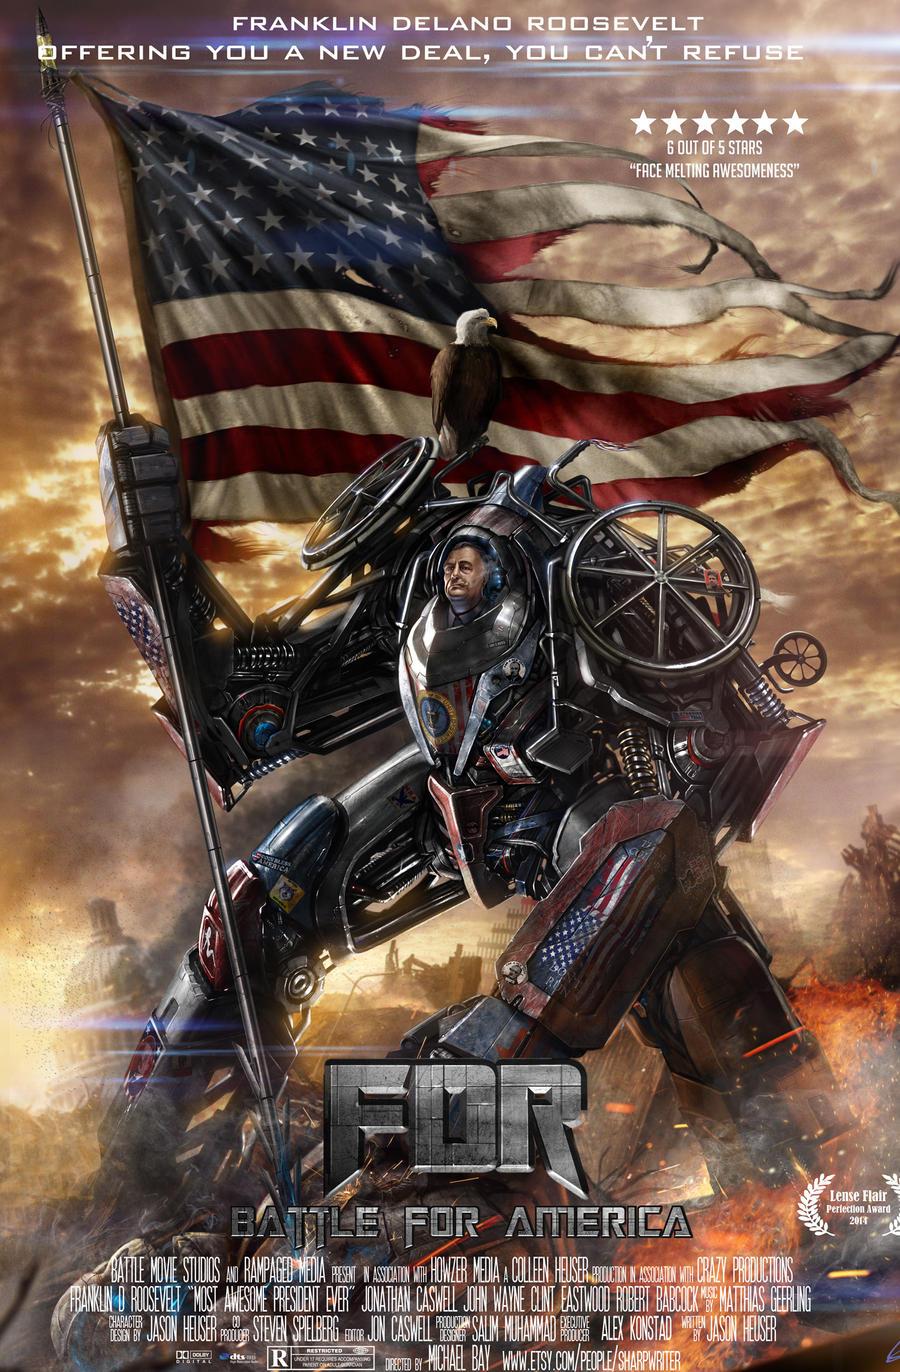 FDR Battle for America Poster by SharpWriter